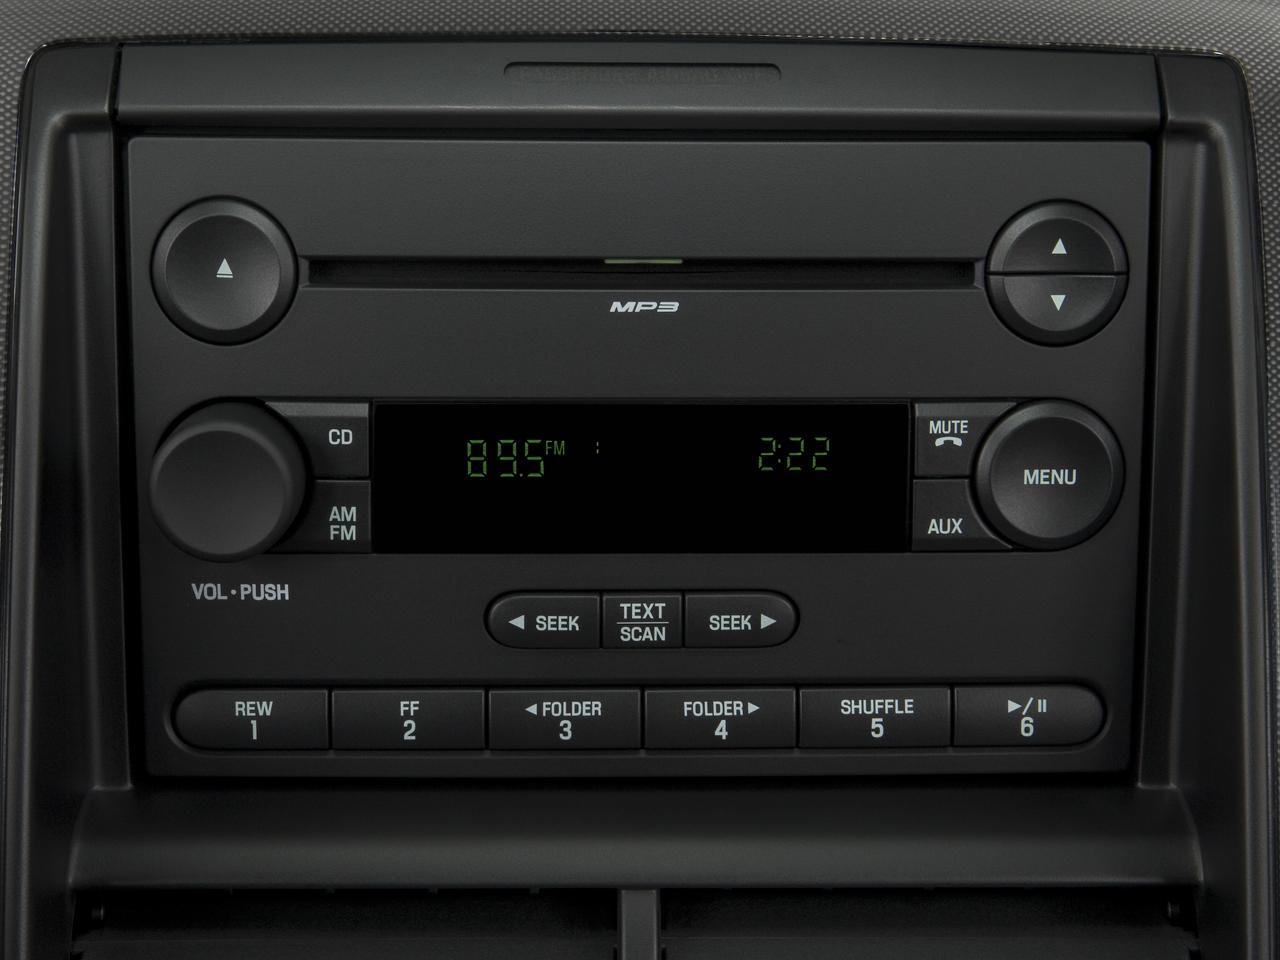 2008 Ford Explorer America Concept Latest News Reviews And Auto Show Coverage Automobile